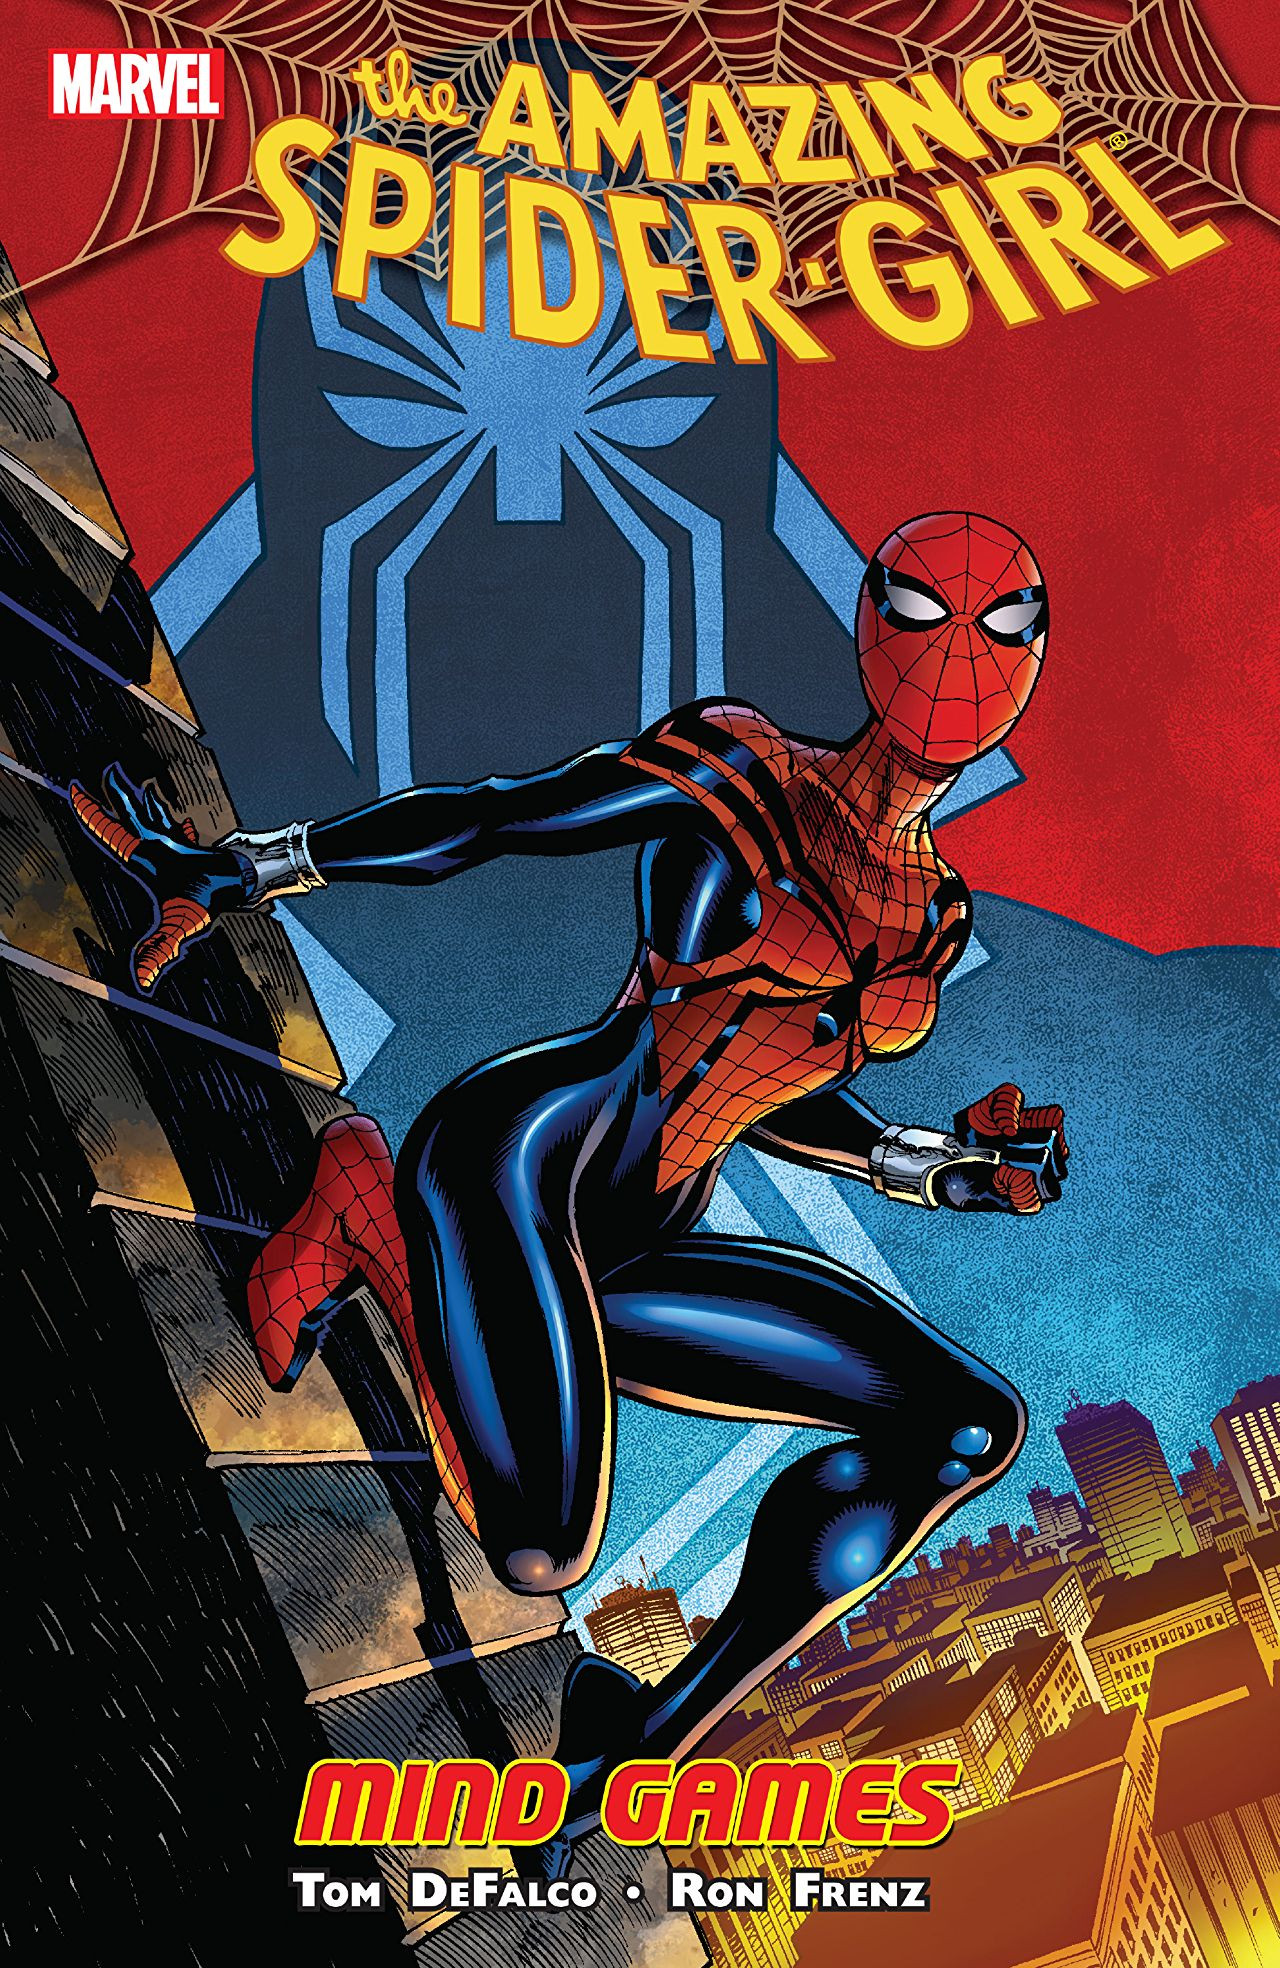 Amazing Spider-Girl TPB Vol 1 3: Mind Games